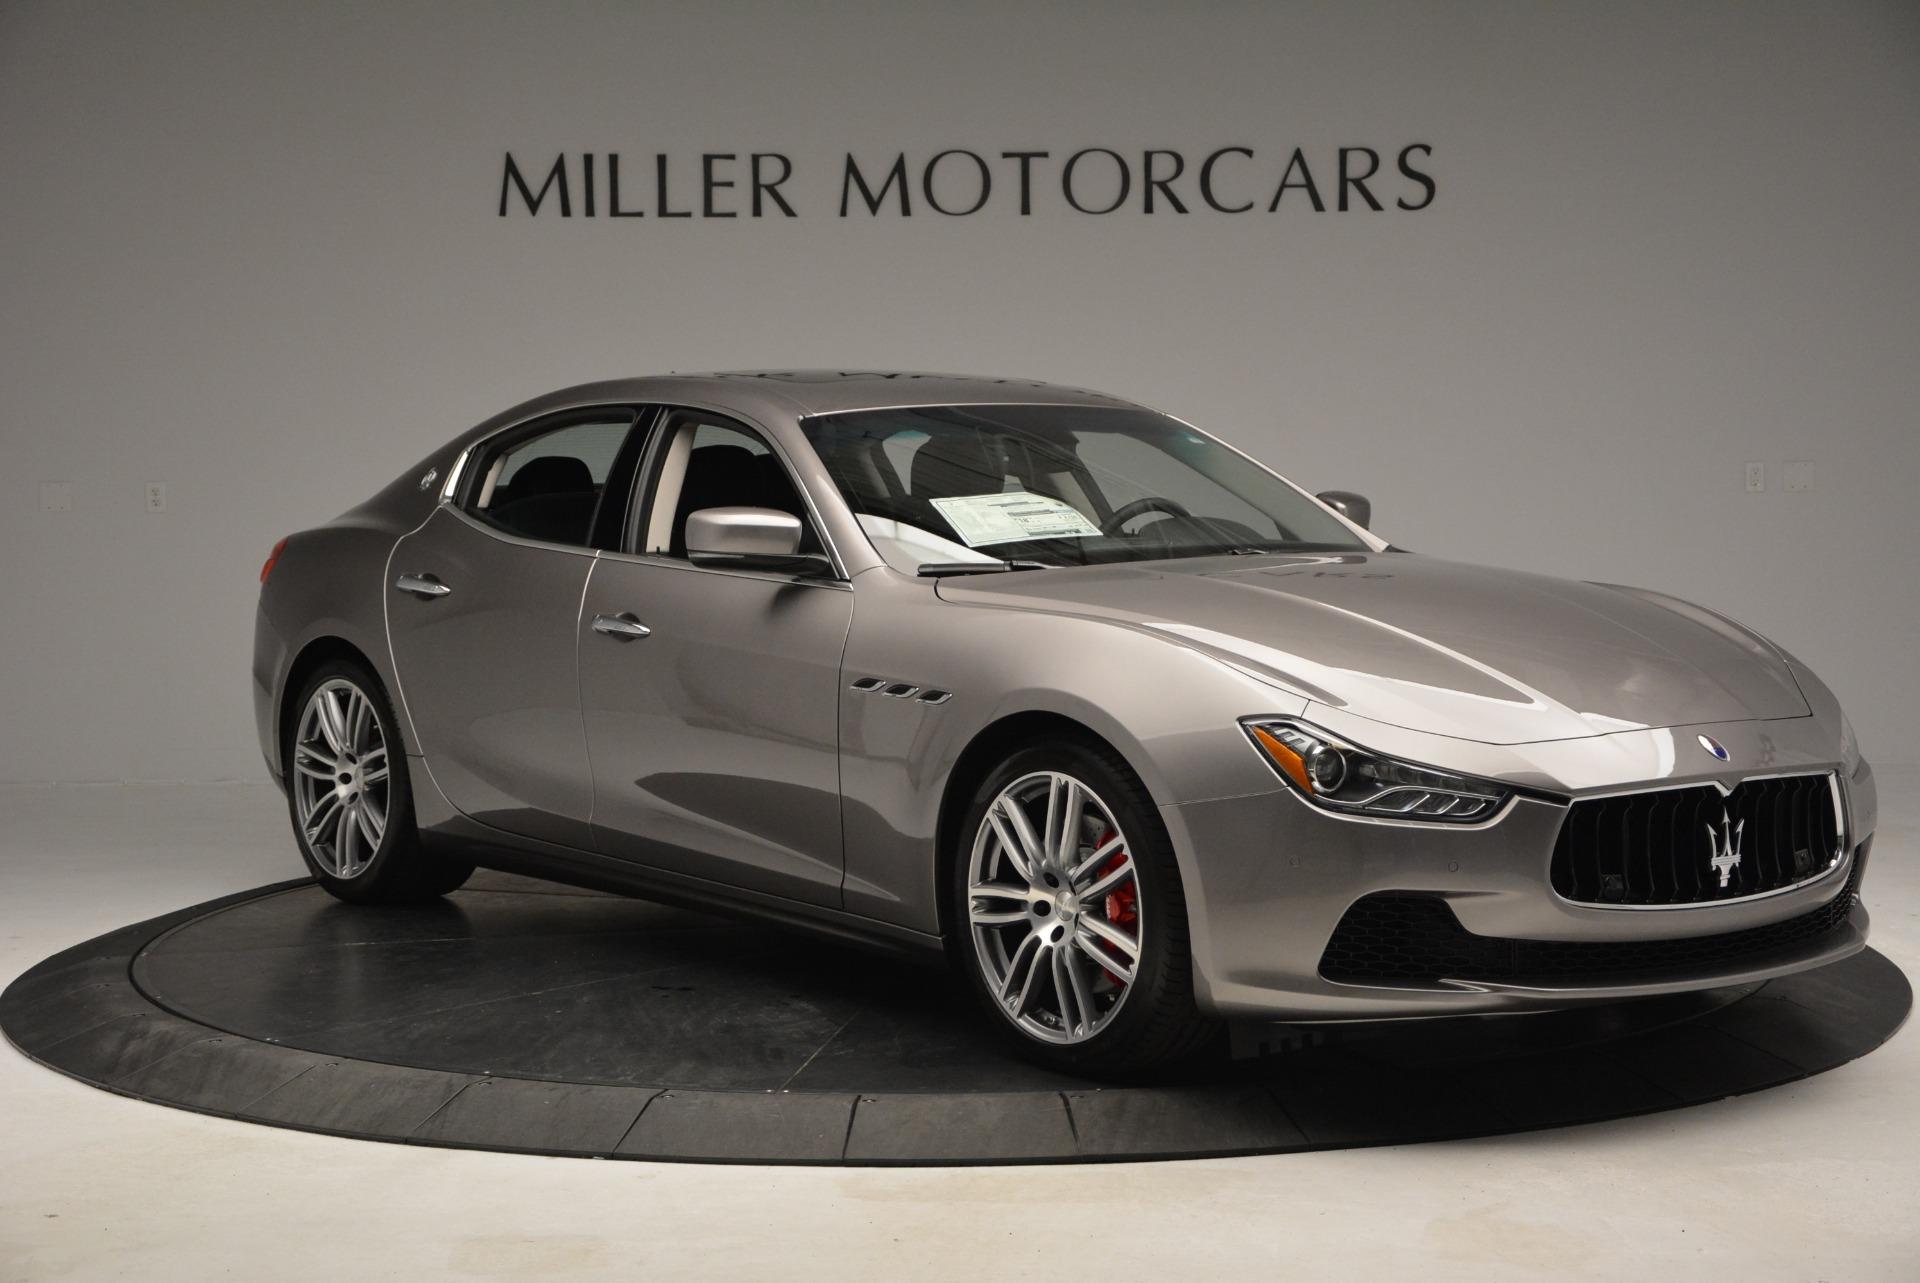 Used 2014 Maserati Ghibli S Q4 For Sale In Greenwich, CT. Alfa Romeo of Greenwich, 7426 2562_p11